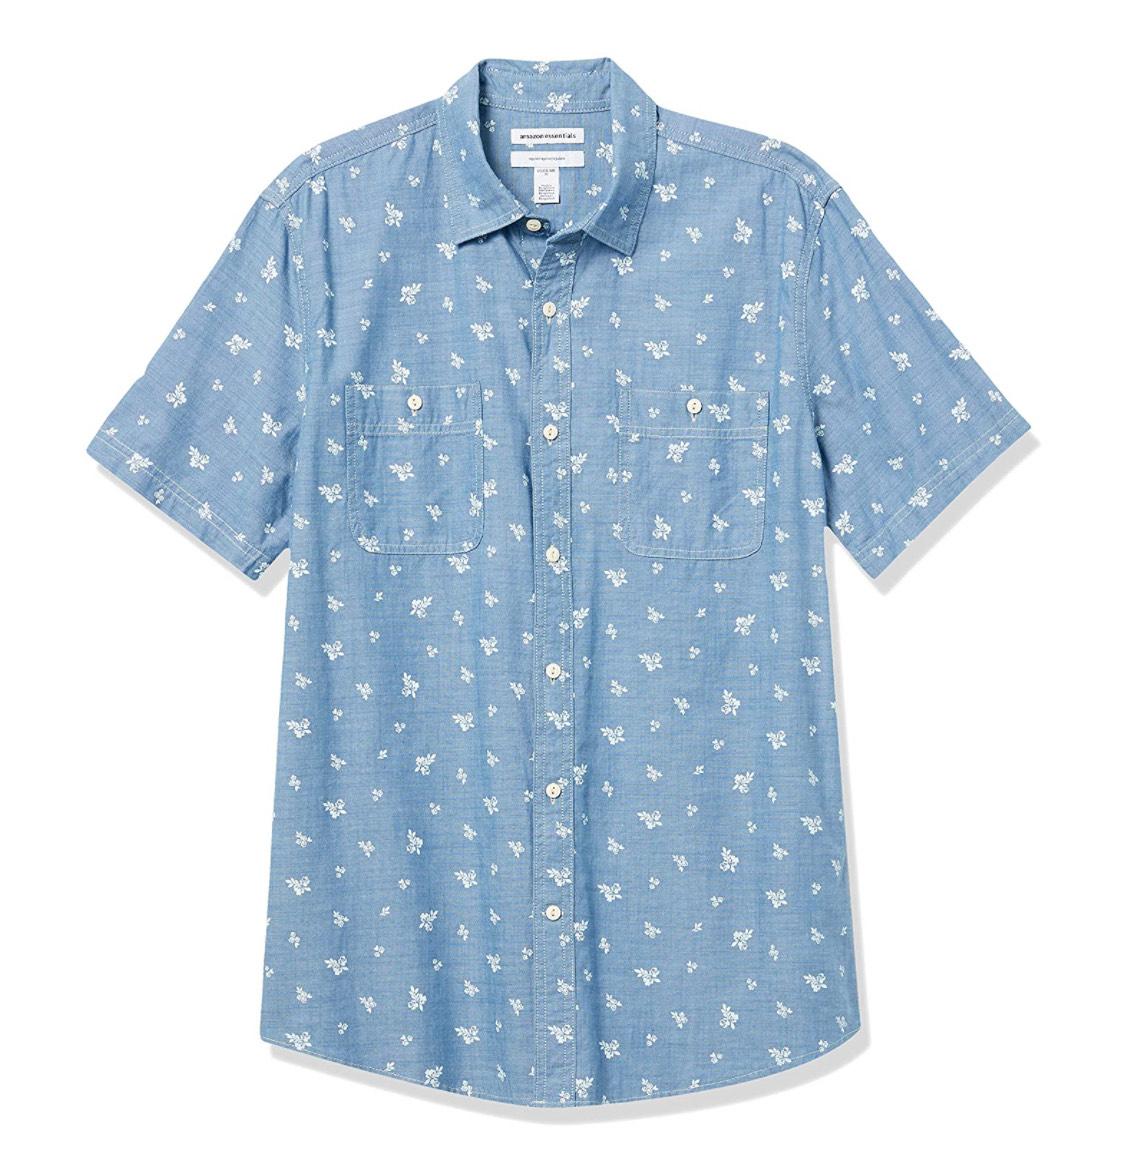 Camisa de manga corta hombres estampado hojas talla XS (M a 7.80€)